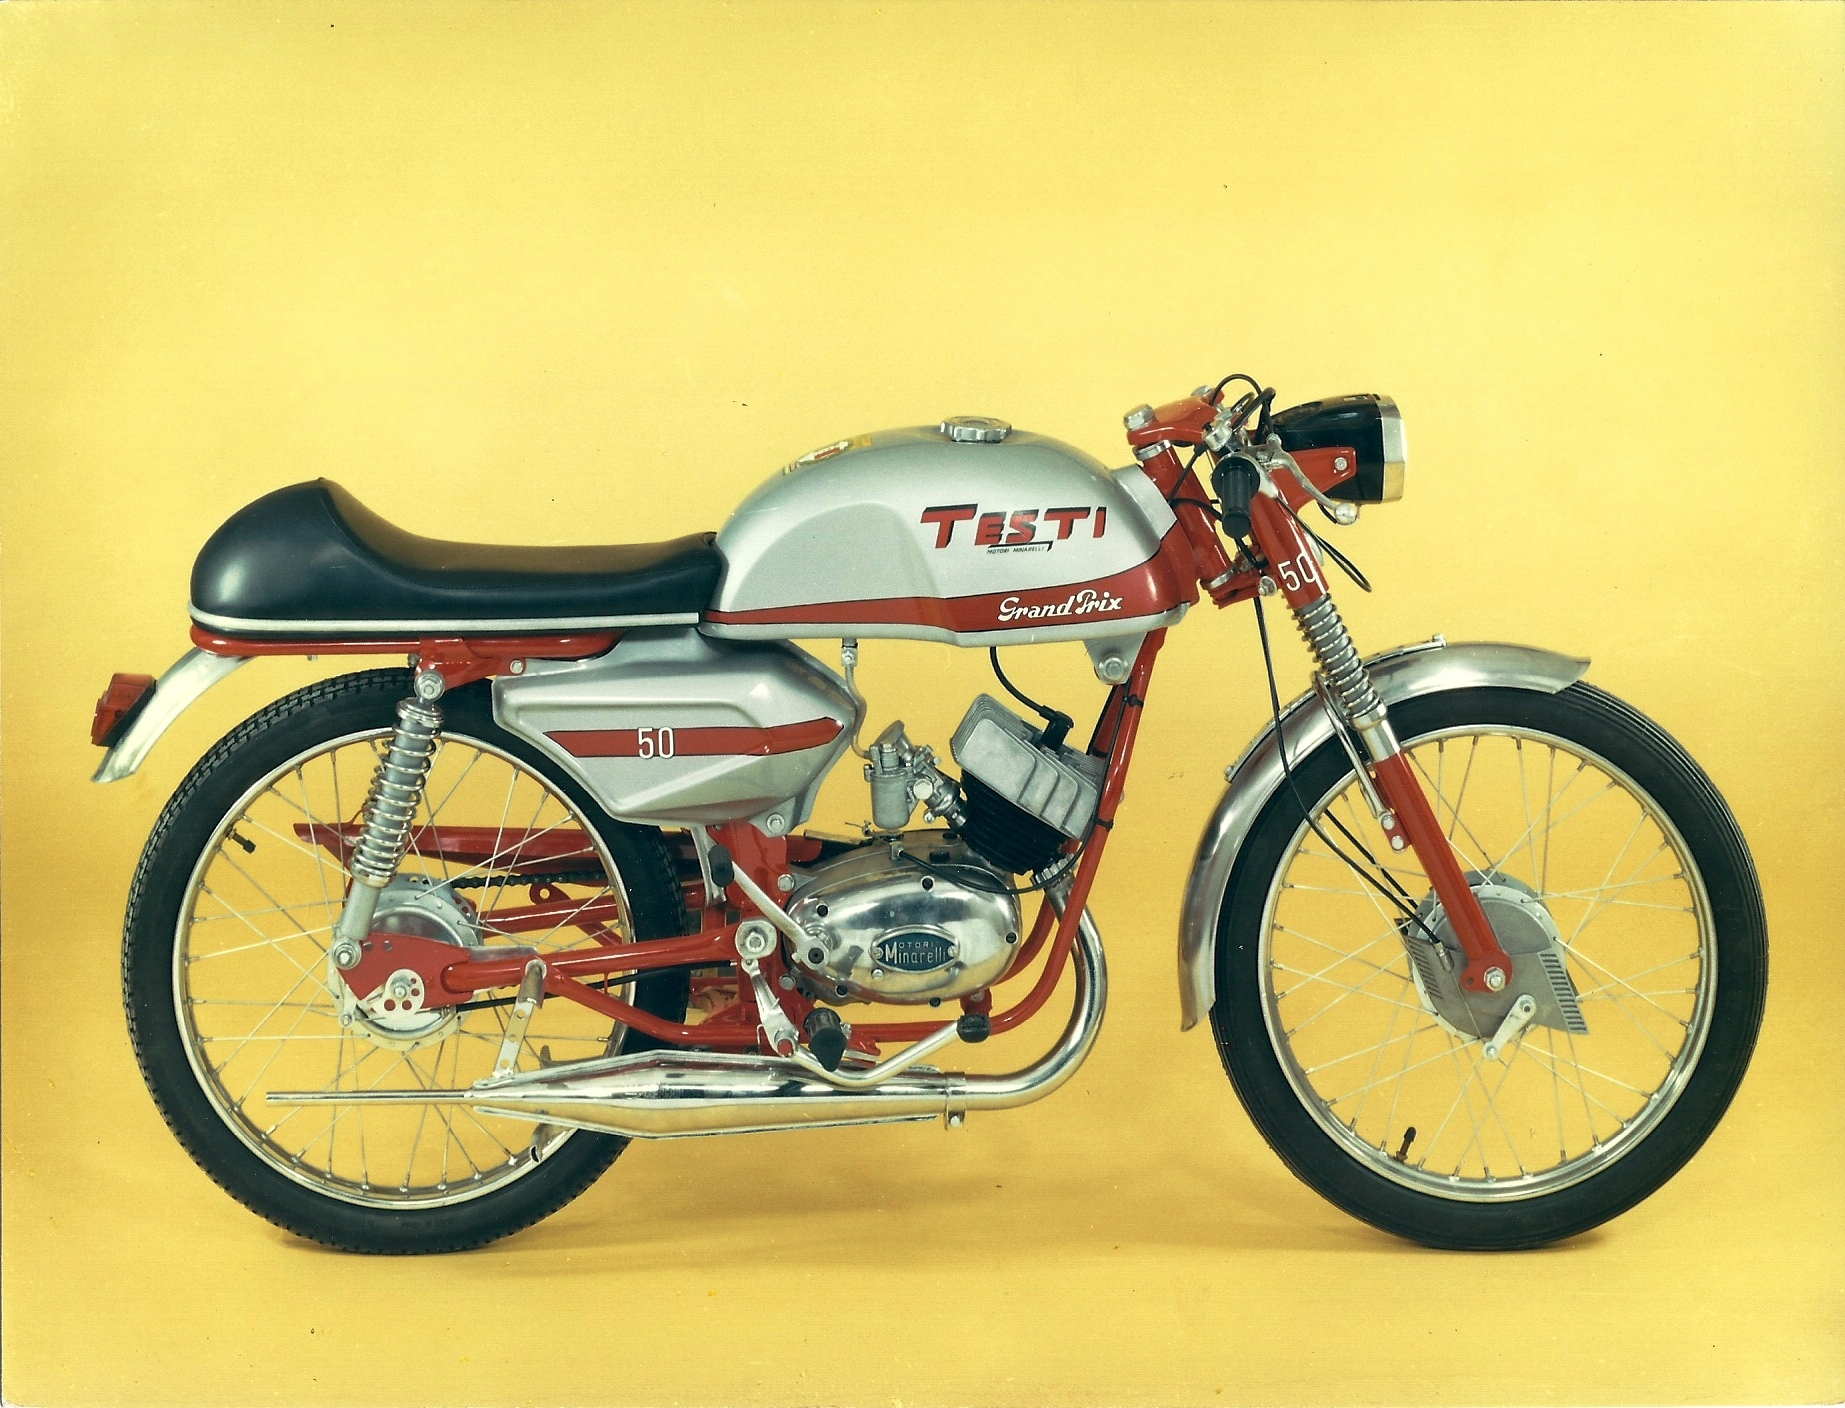 1968 - Testi Grand Prix Super-02